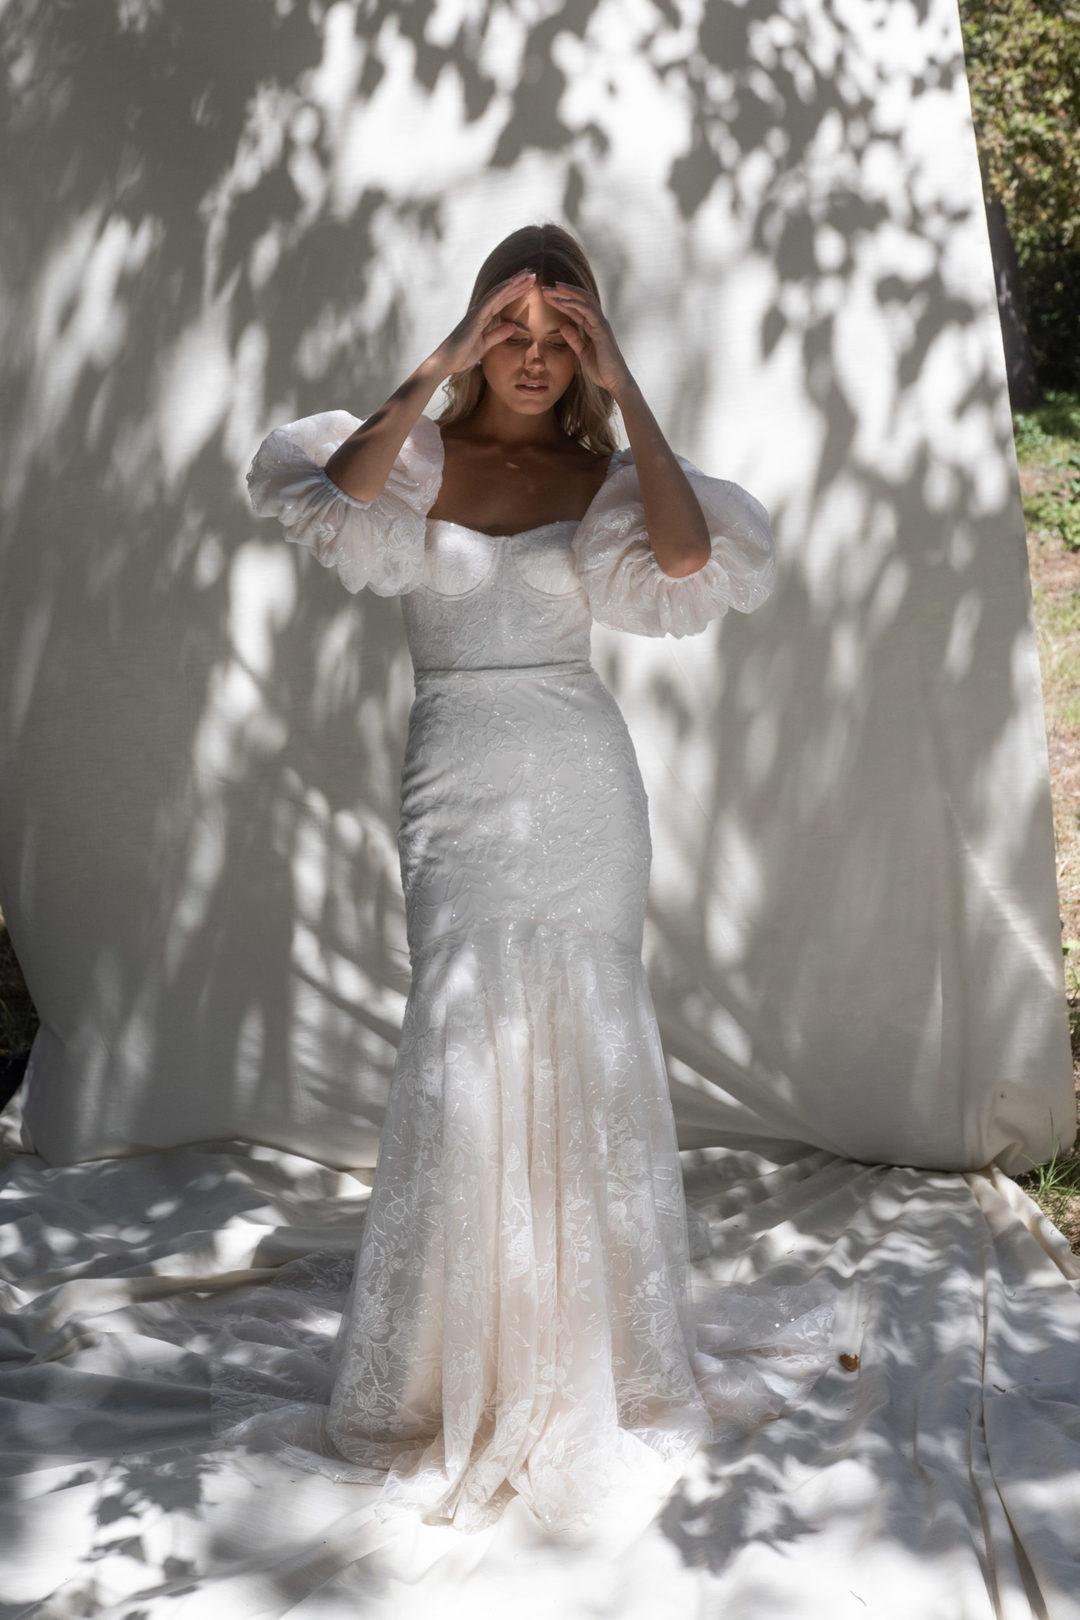 ellery gown dress photo